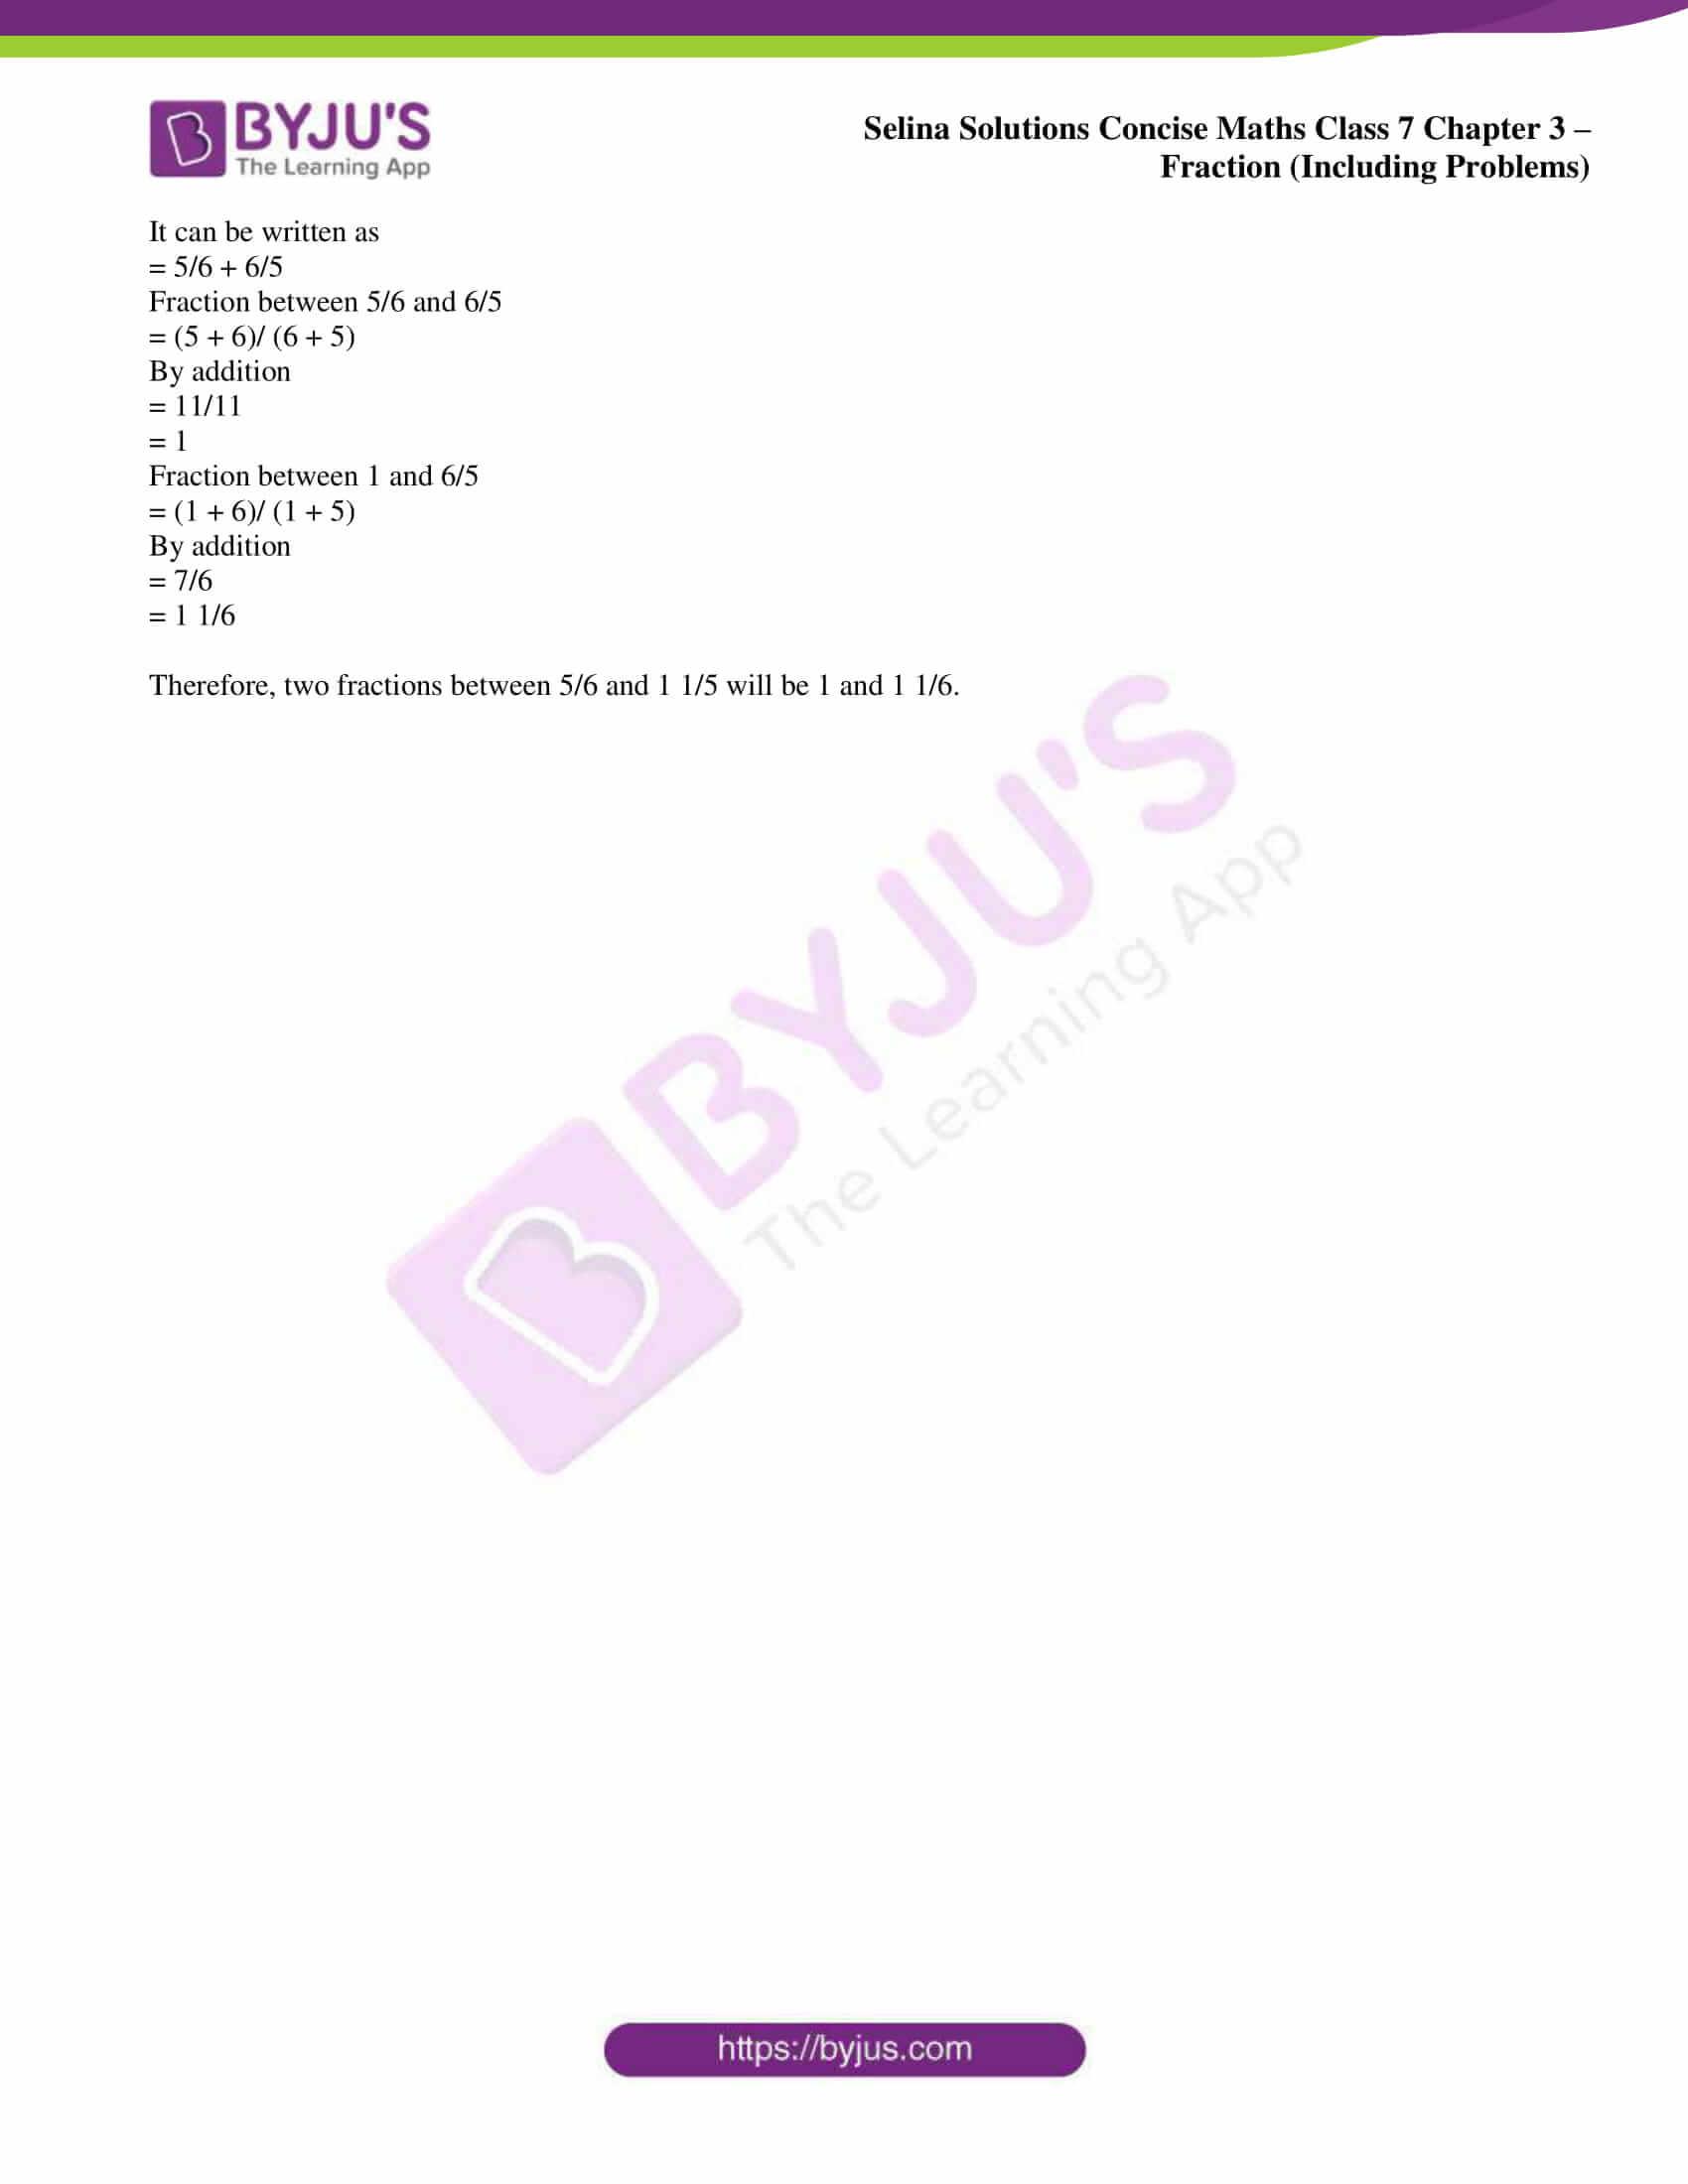 selina sol concise maths class 7 ch3 ex 3b 7